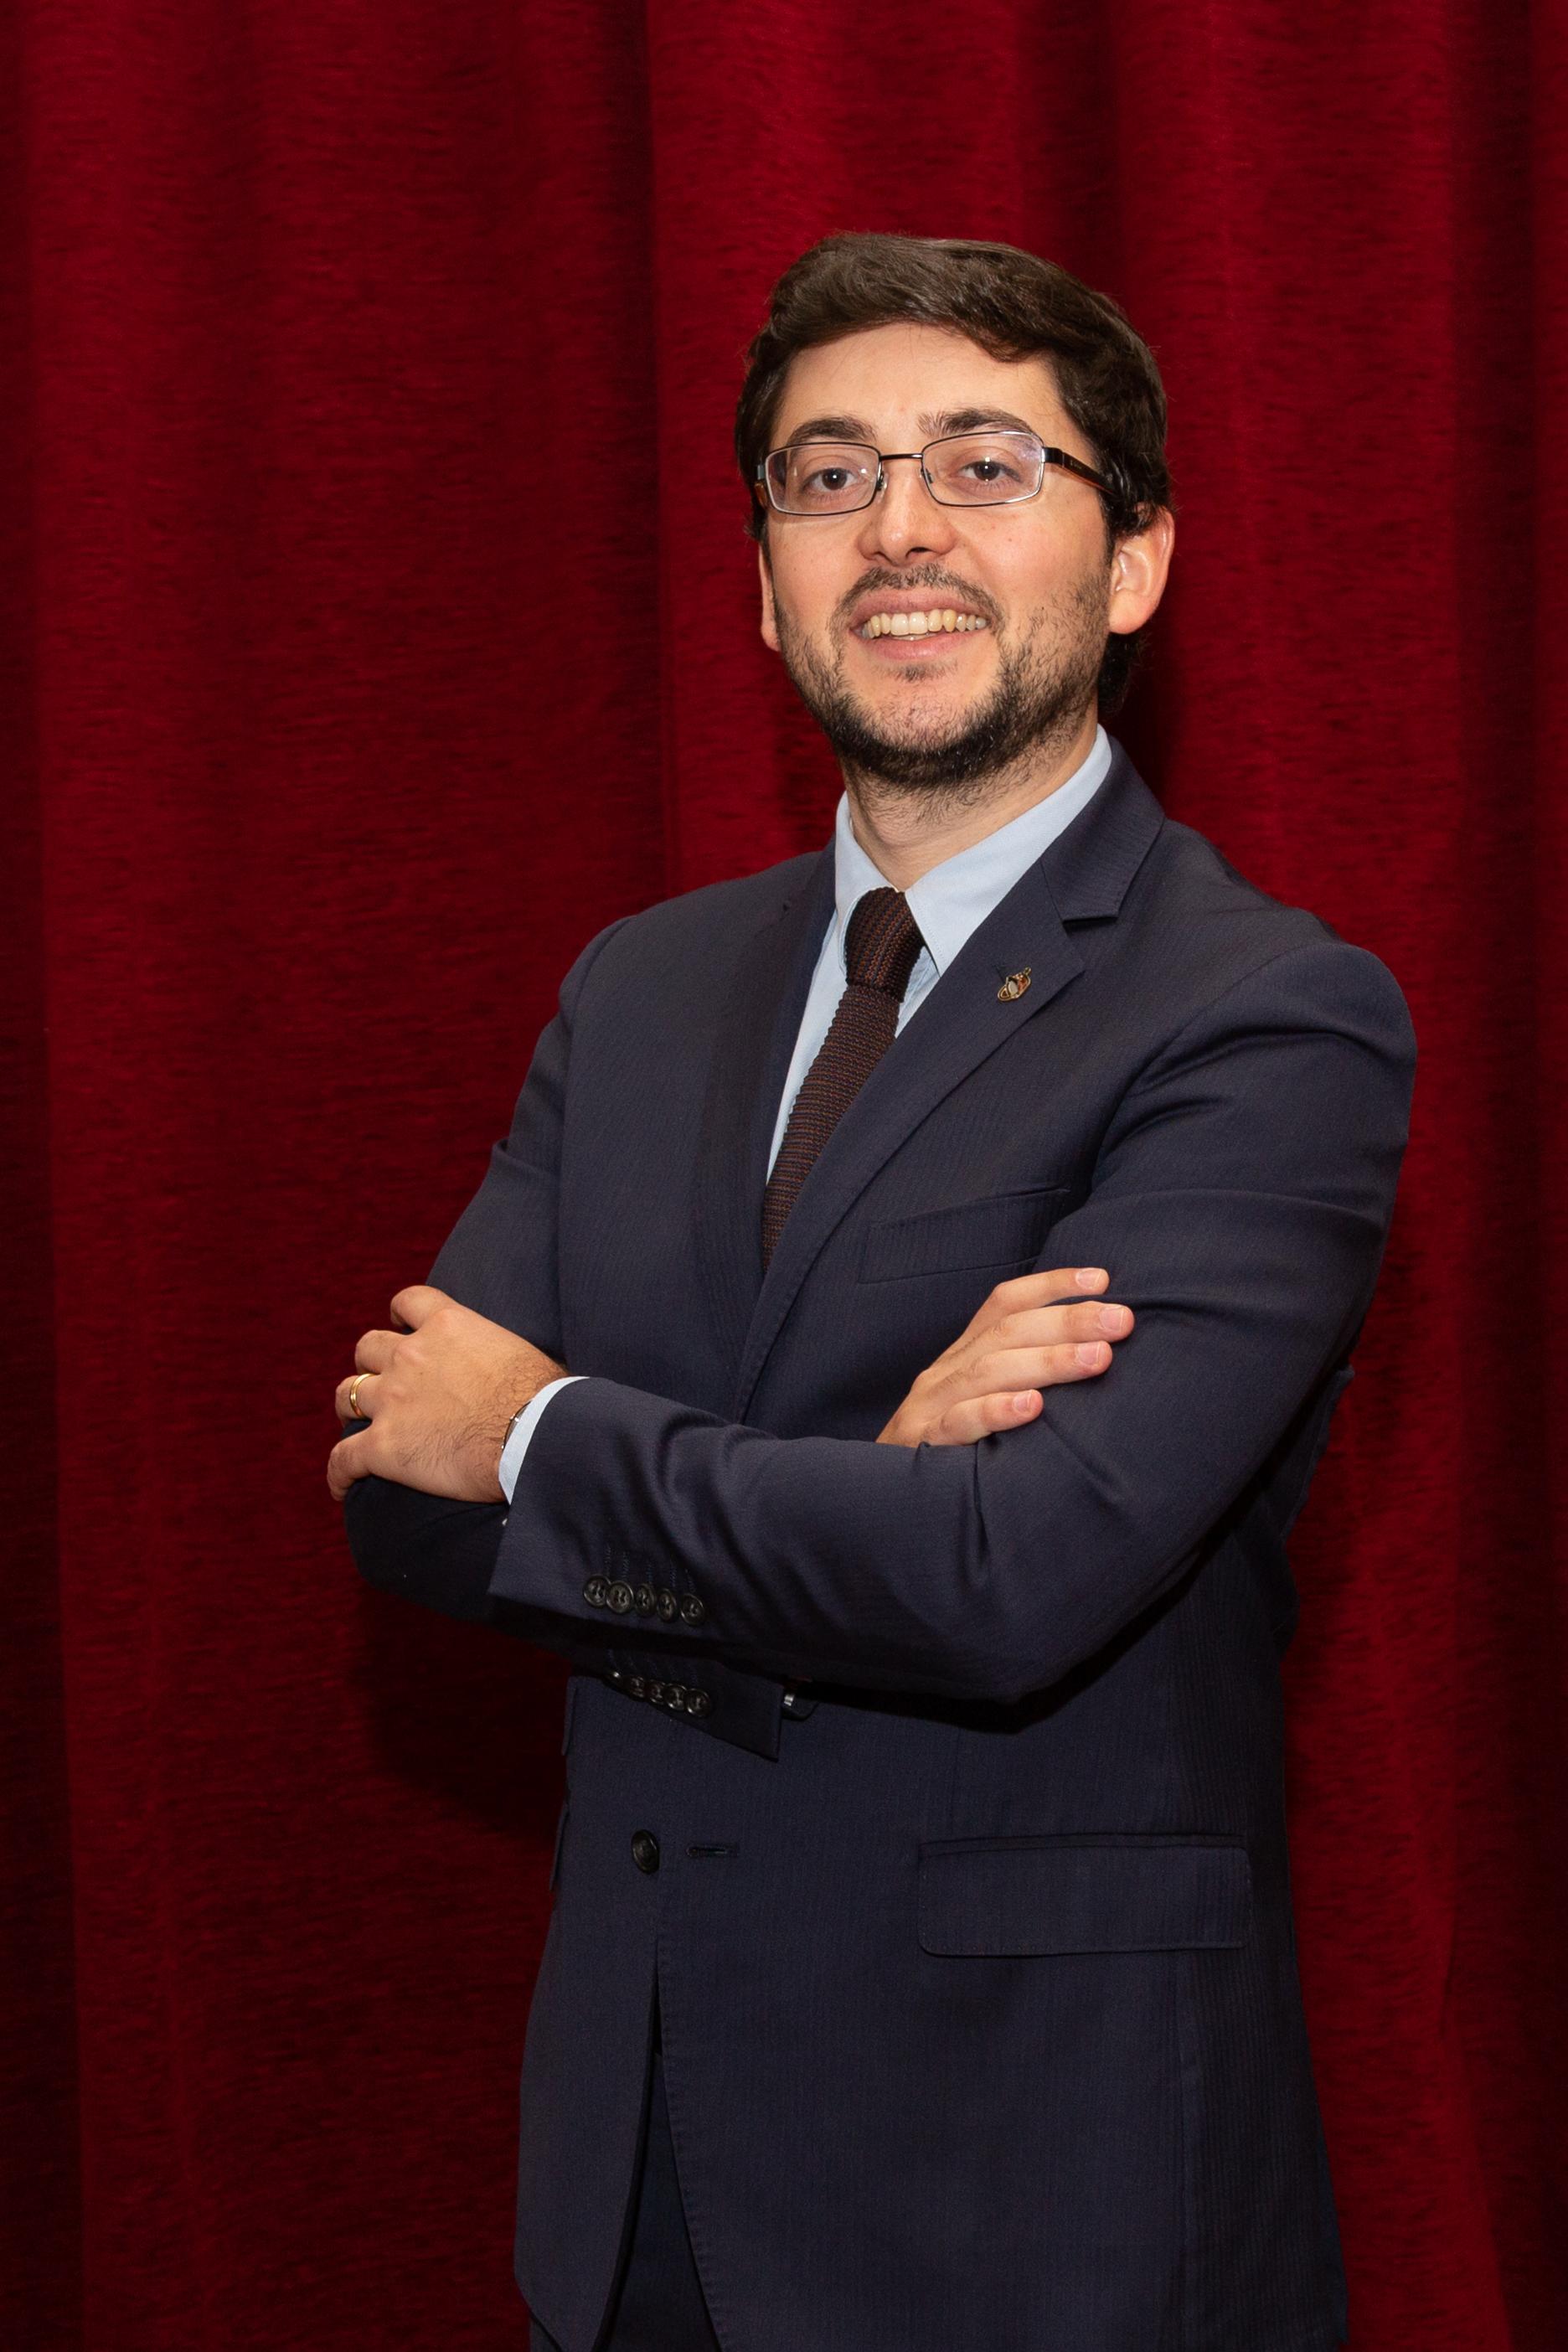 Ricardo Neto Galvão